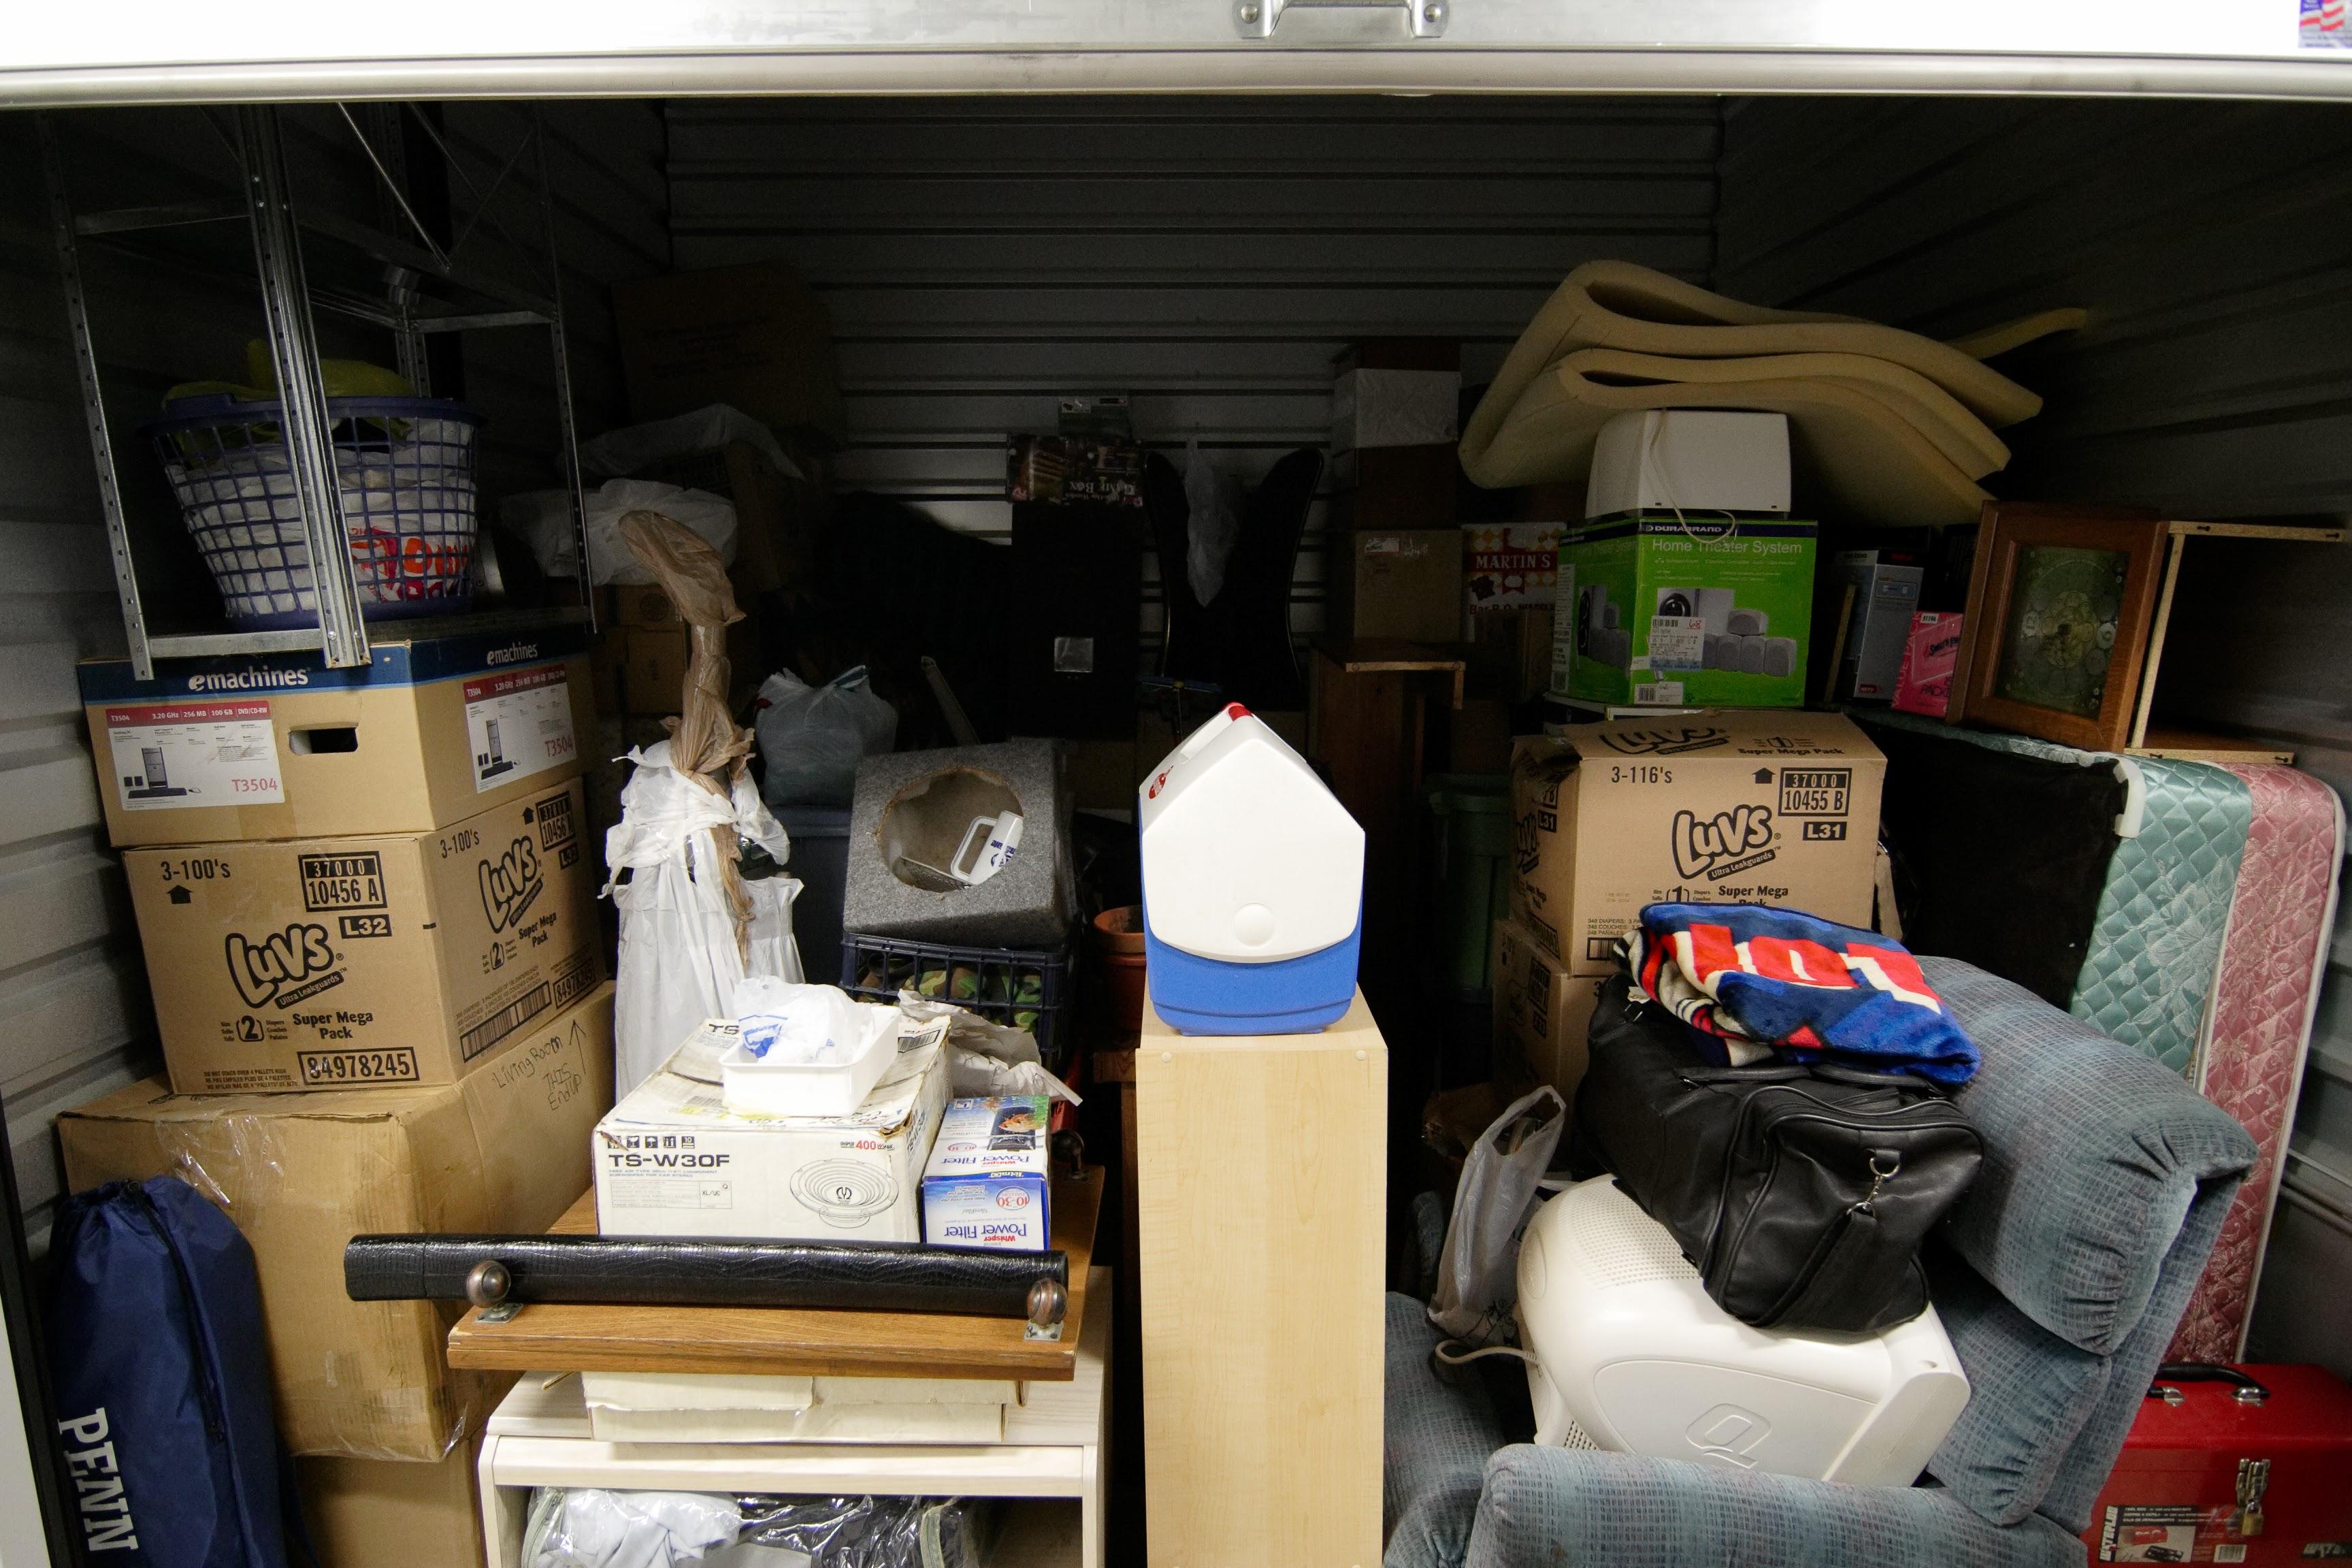 open storage unit, full